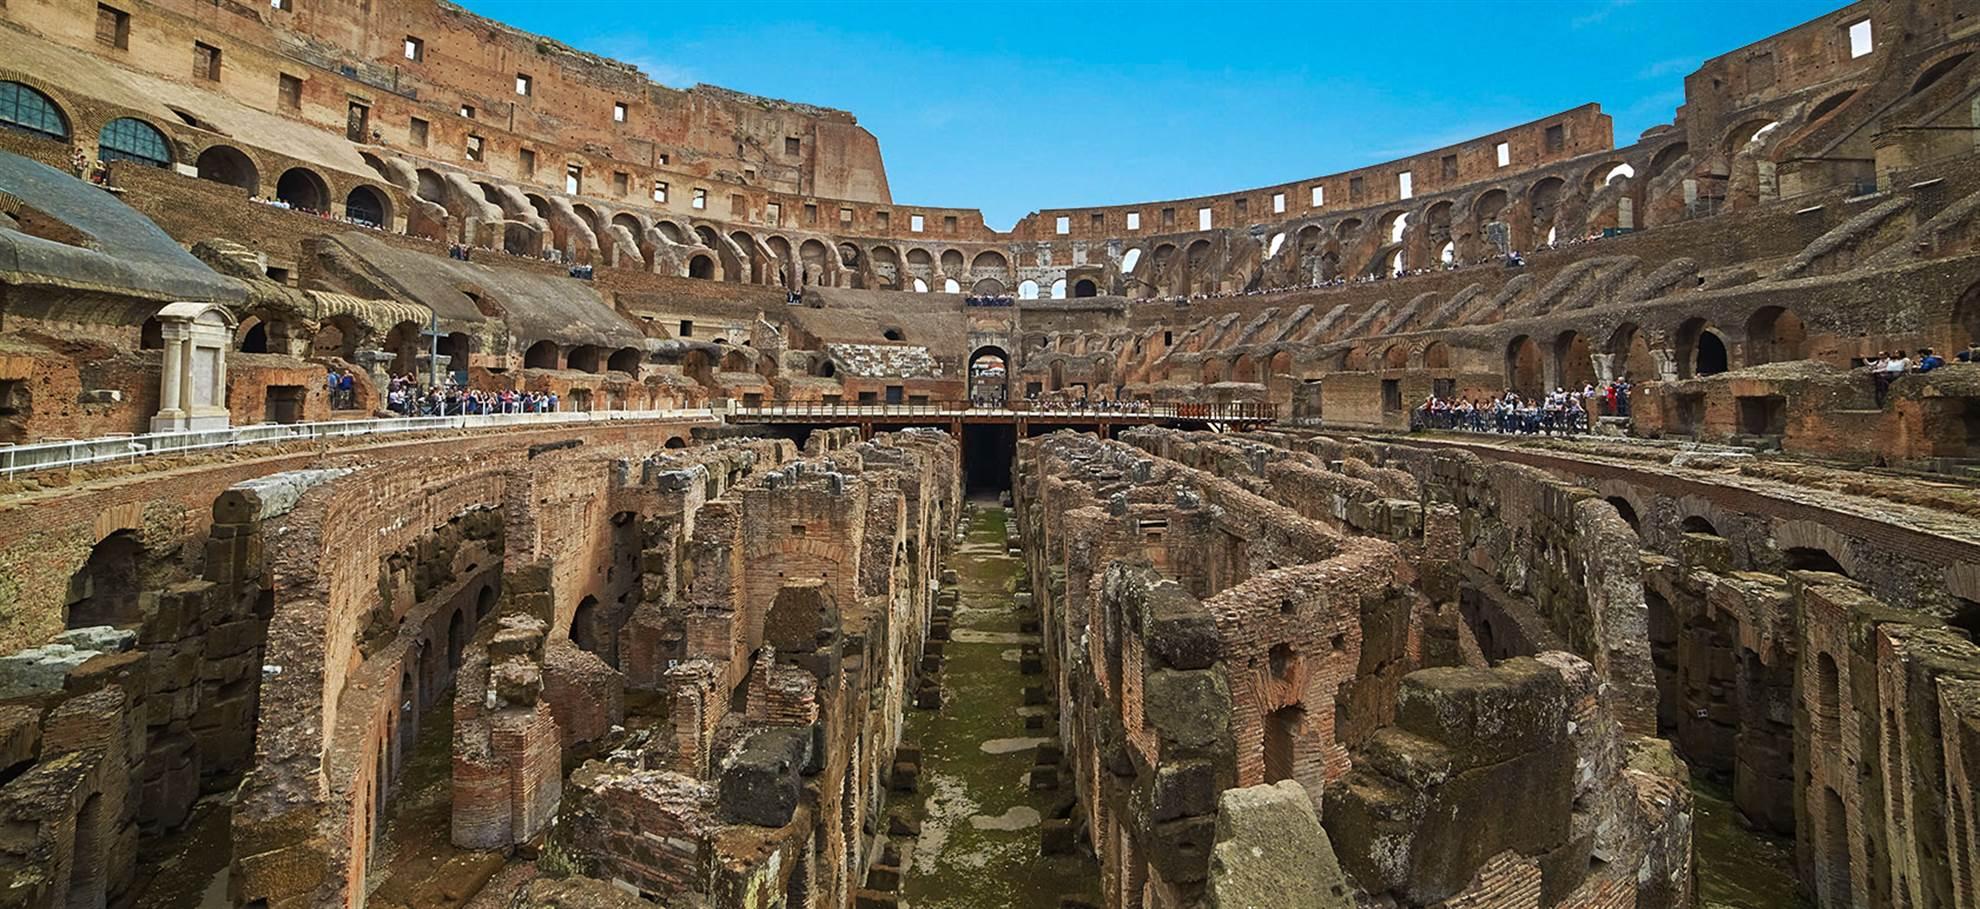 Colosseum Skip the Line! Tour in het Engels